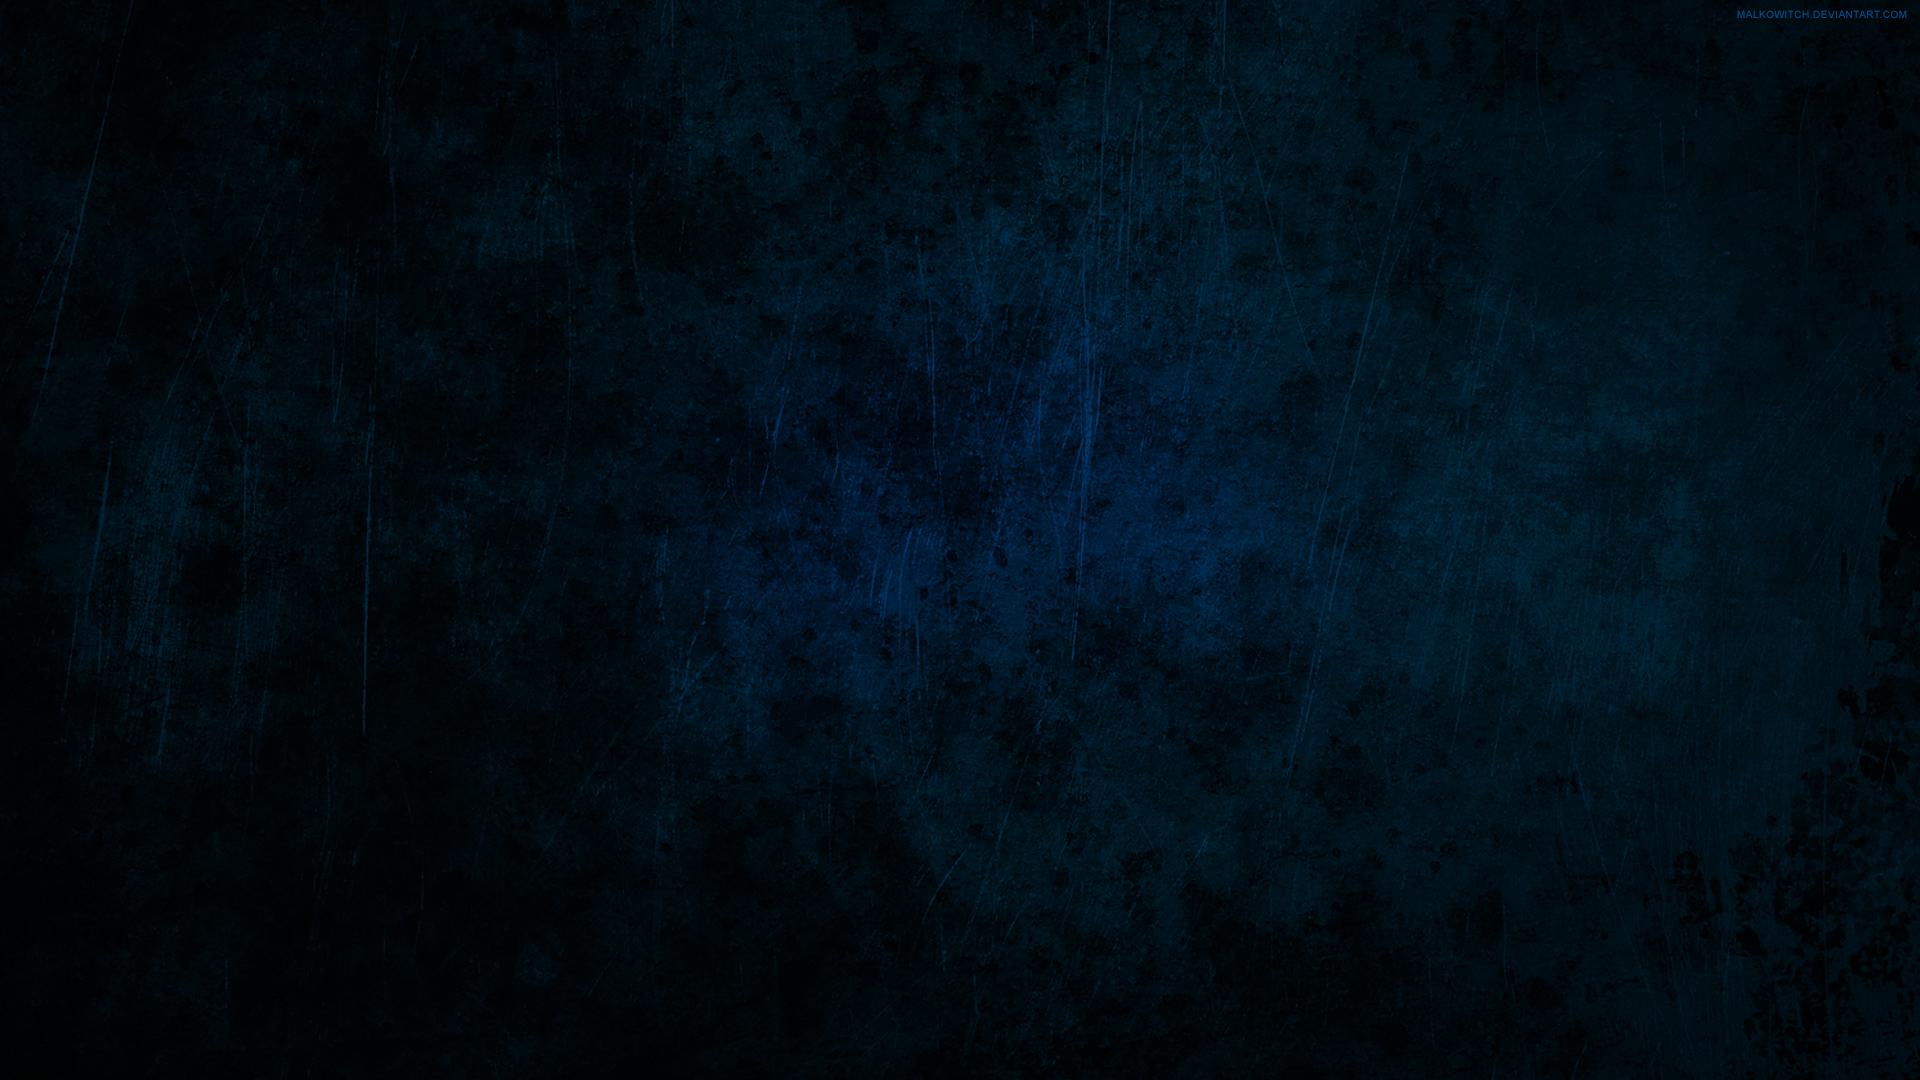 Dark Blue Wallpaper by malkowitch 1920x1080